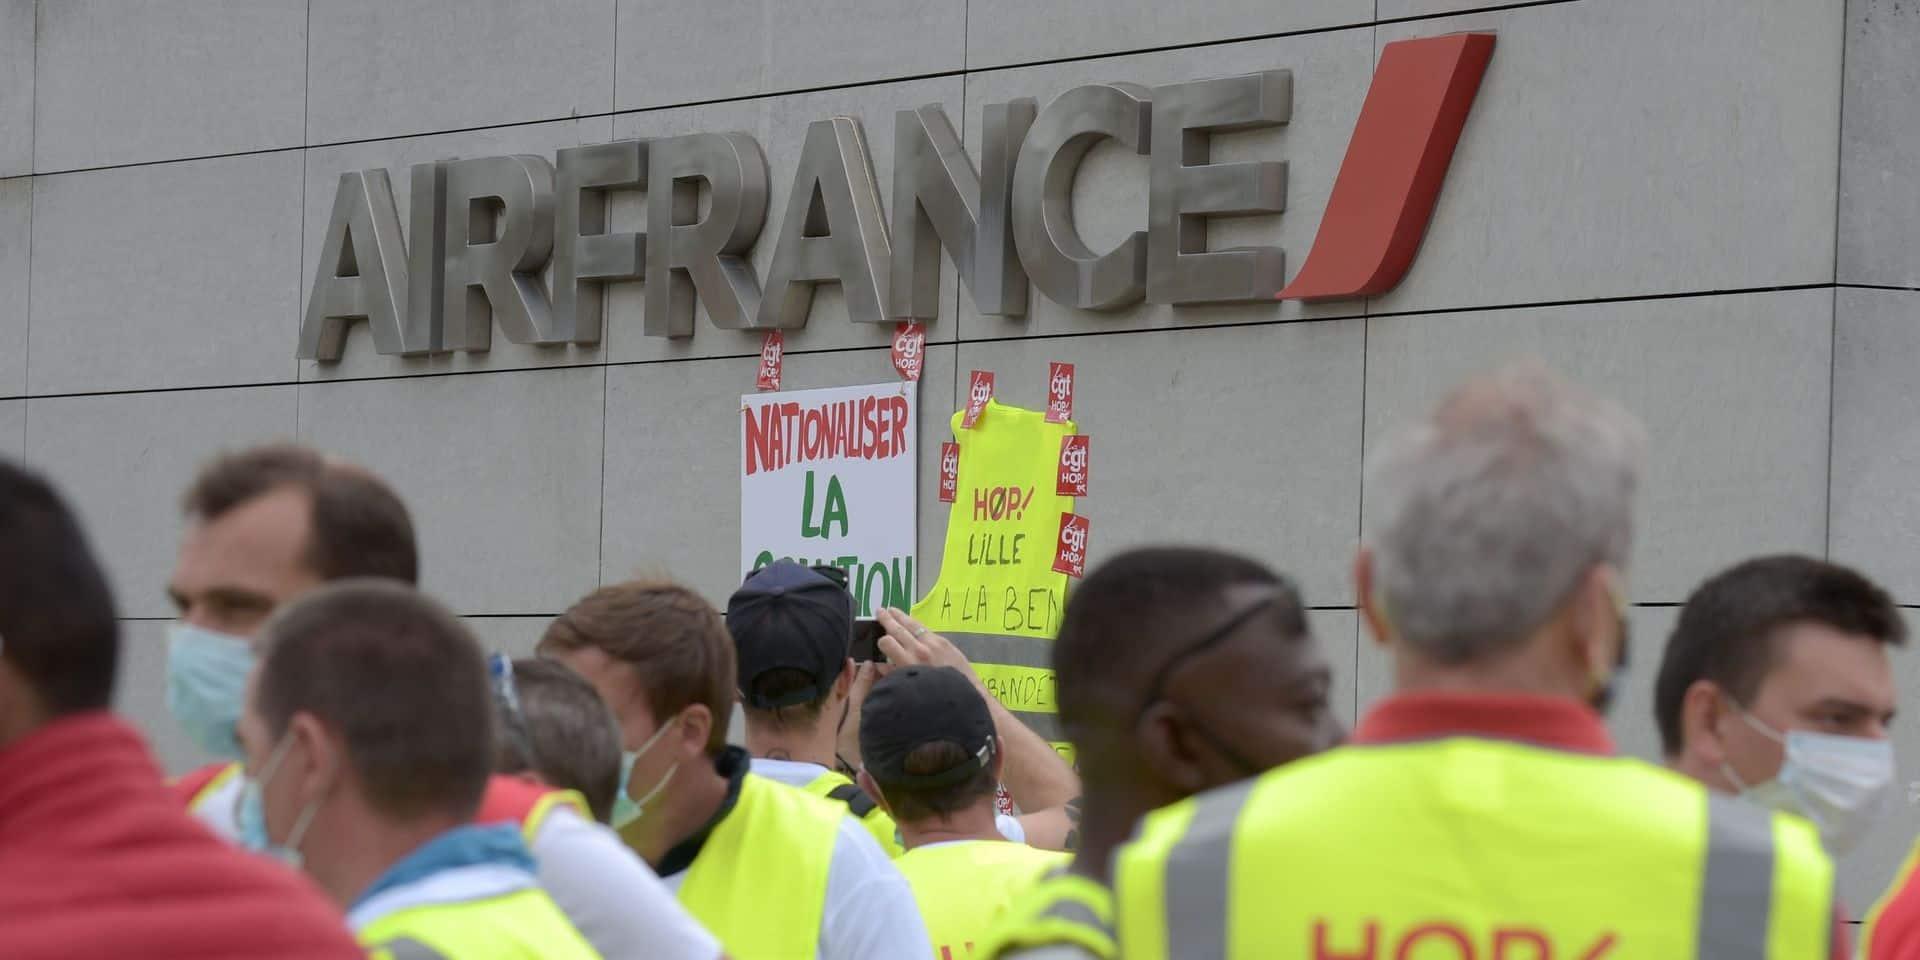 Le groupe Air France va supprimer 7.580 postes d'ici fin 2022